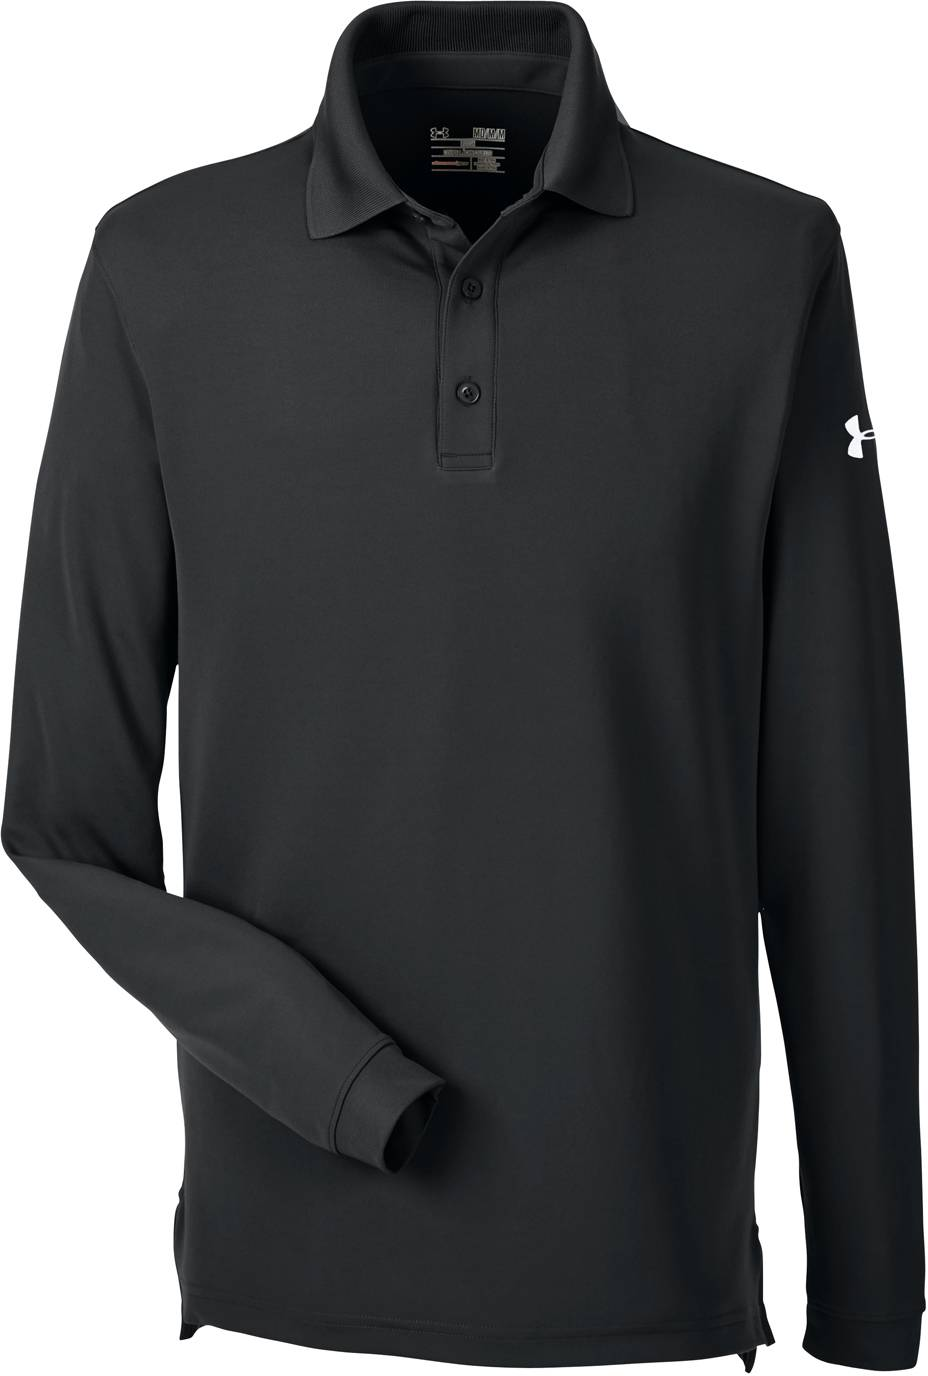 Under Armour Mens Custom Corporate Performance Long Sleeve Polo